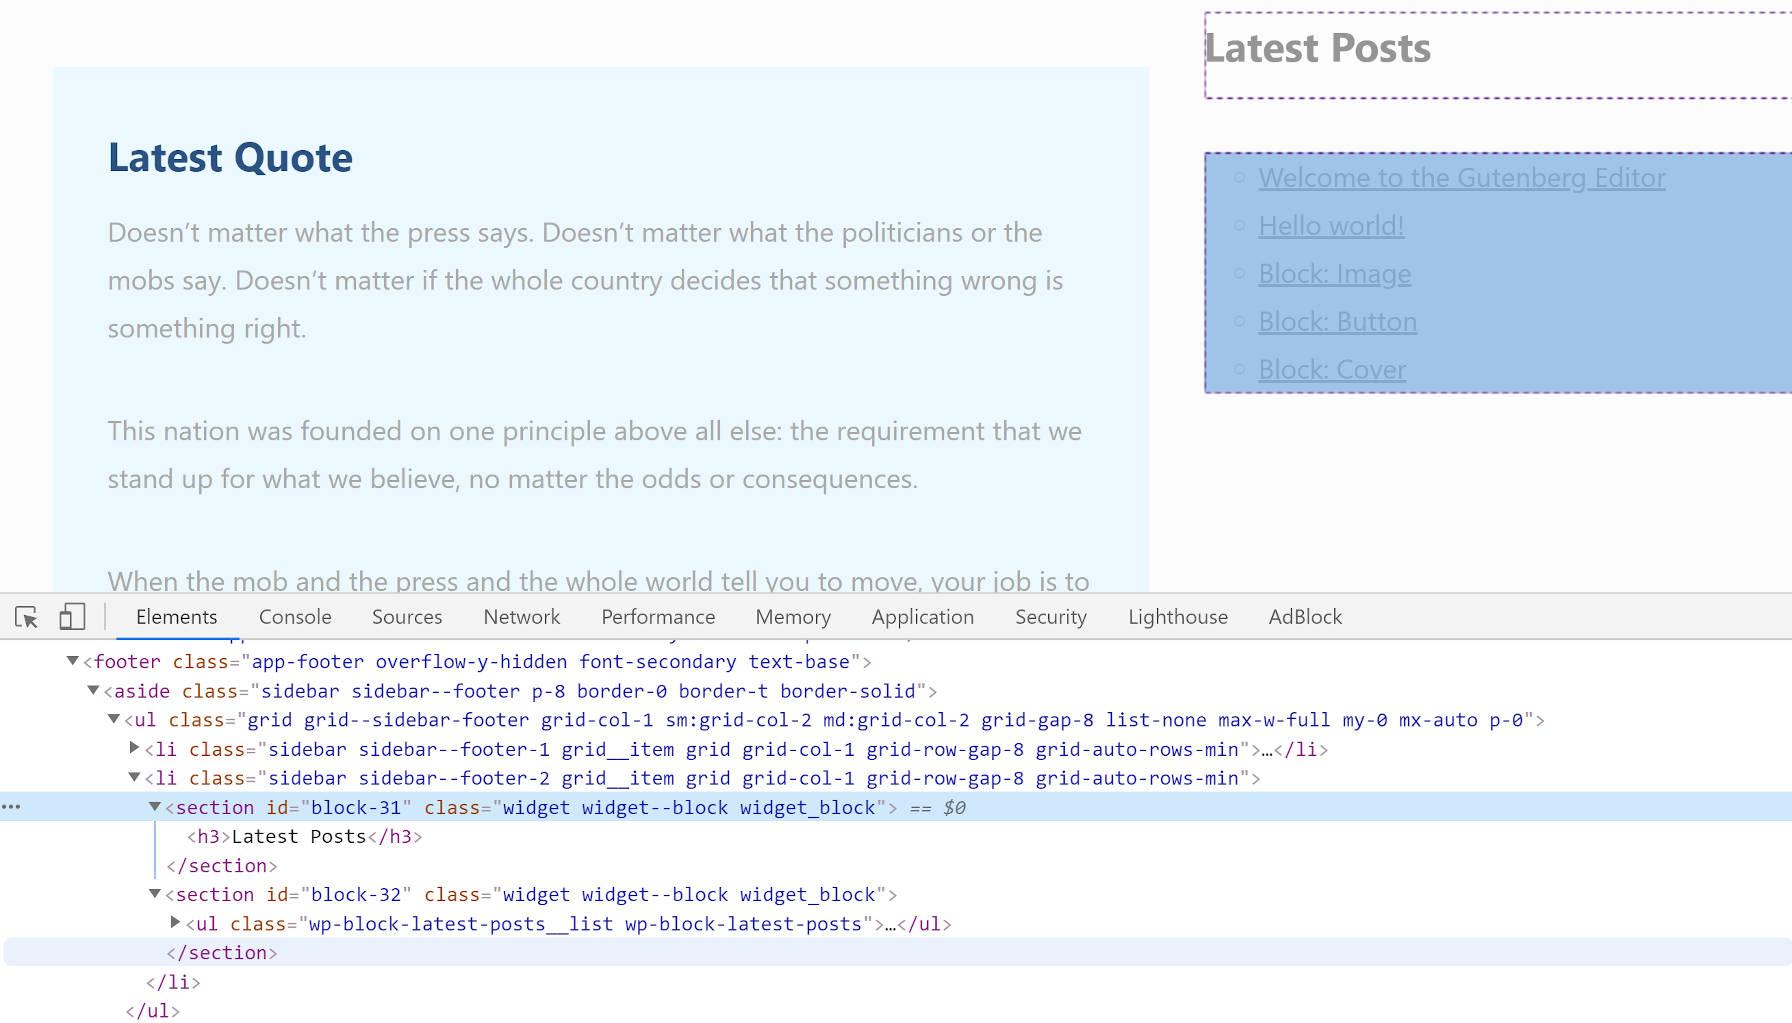 Affichage en direct et en code du code HTML incorrect du wrapper de widget dans Gutenberg.